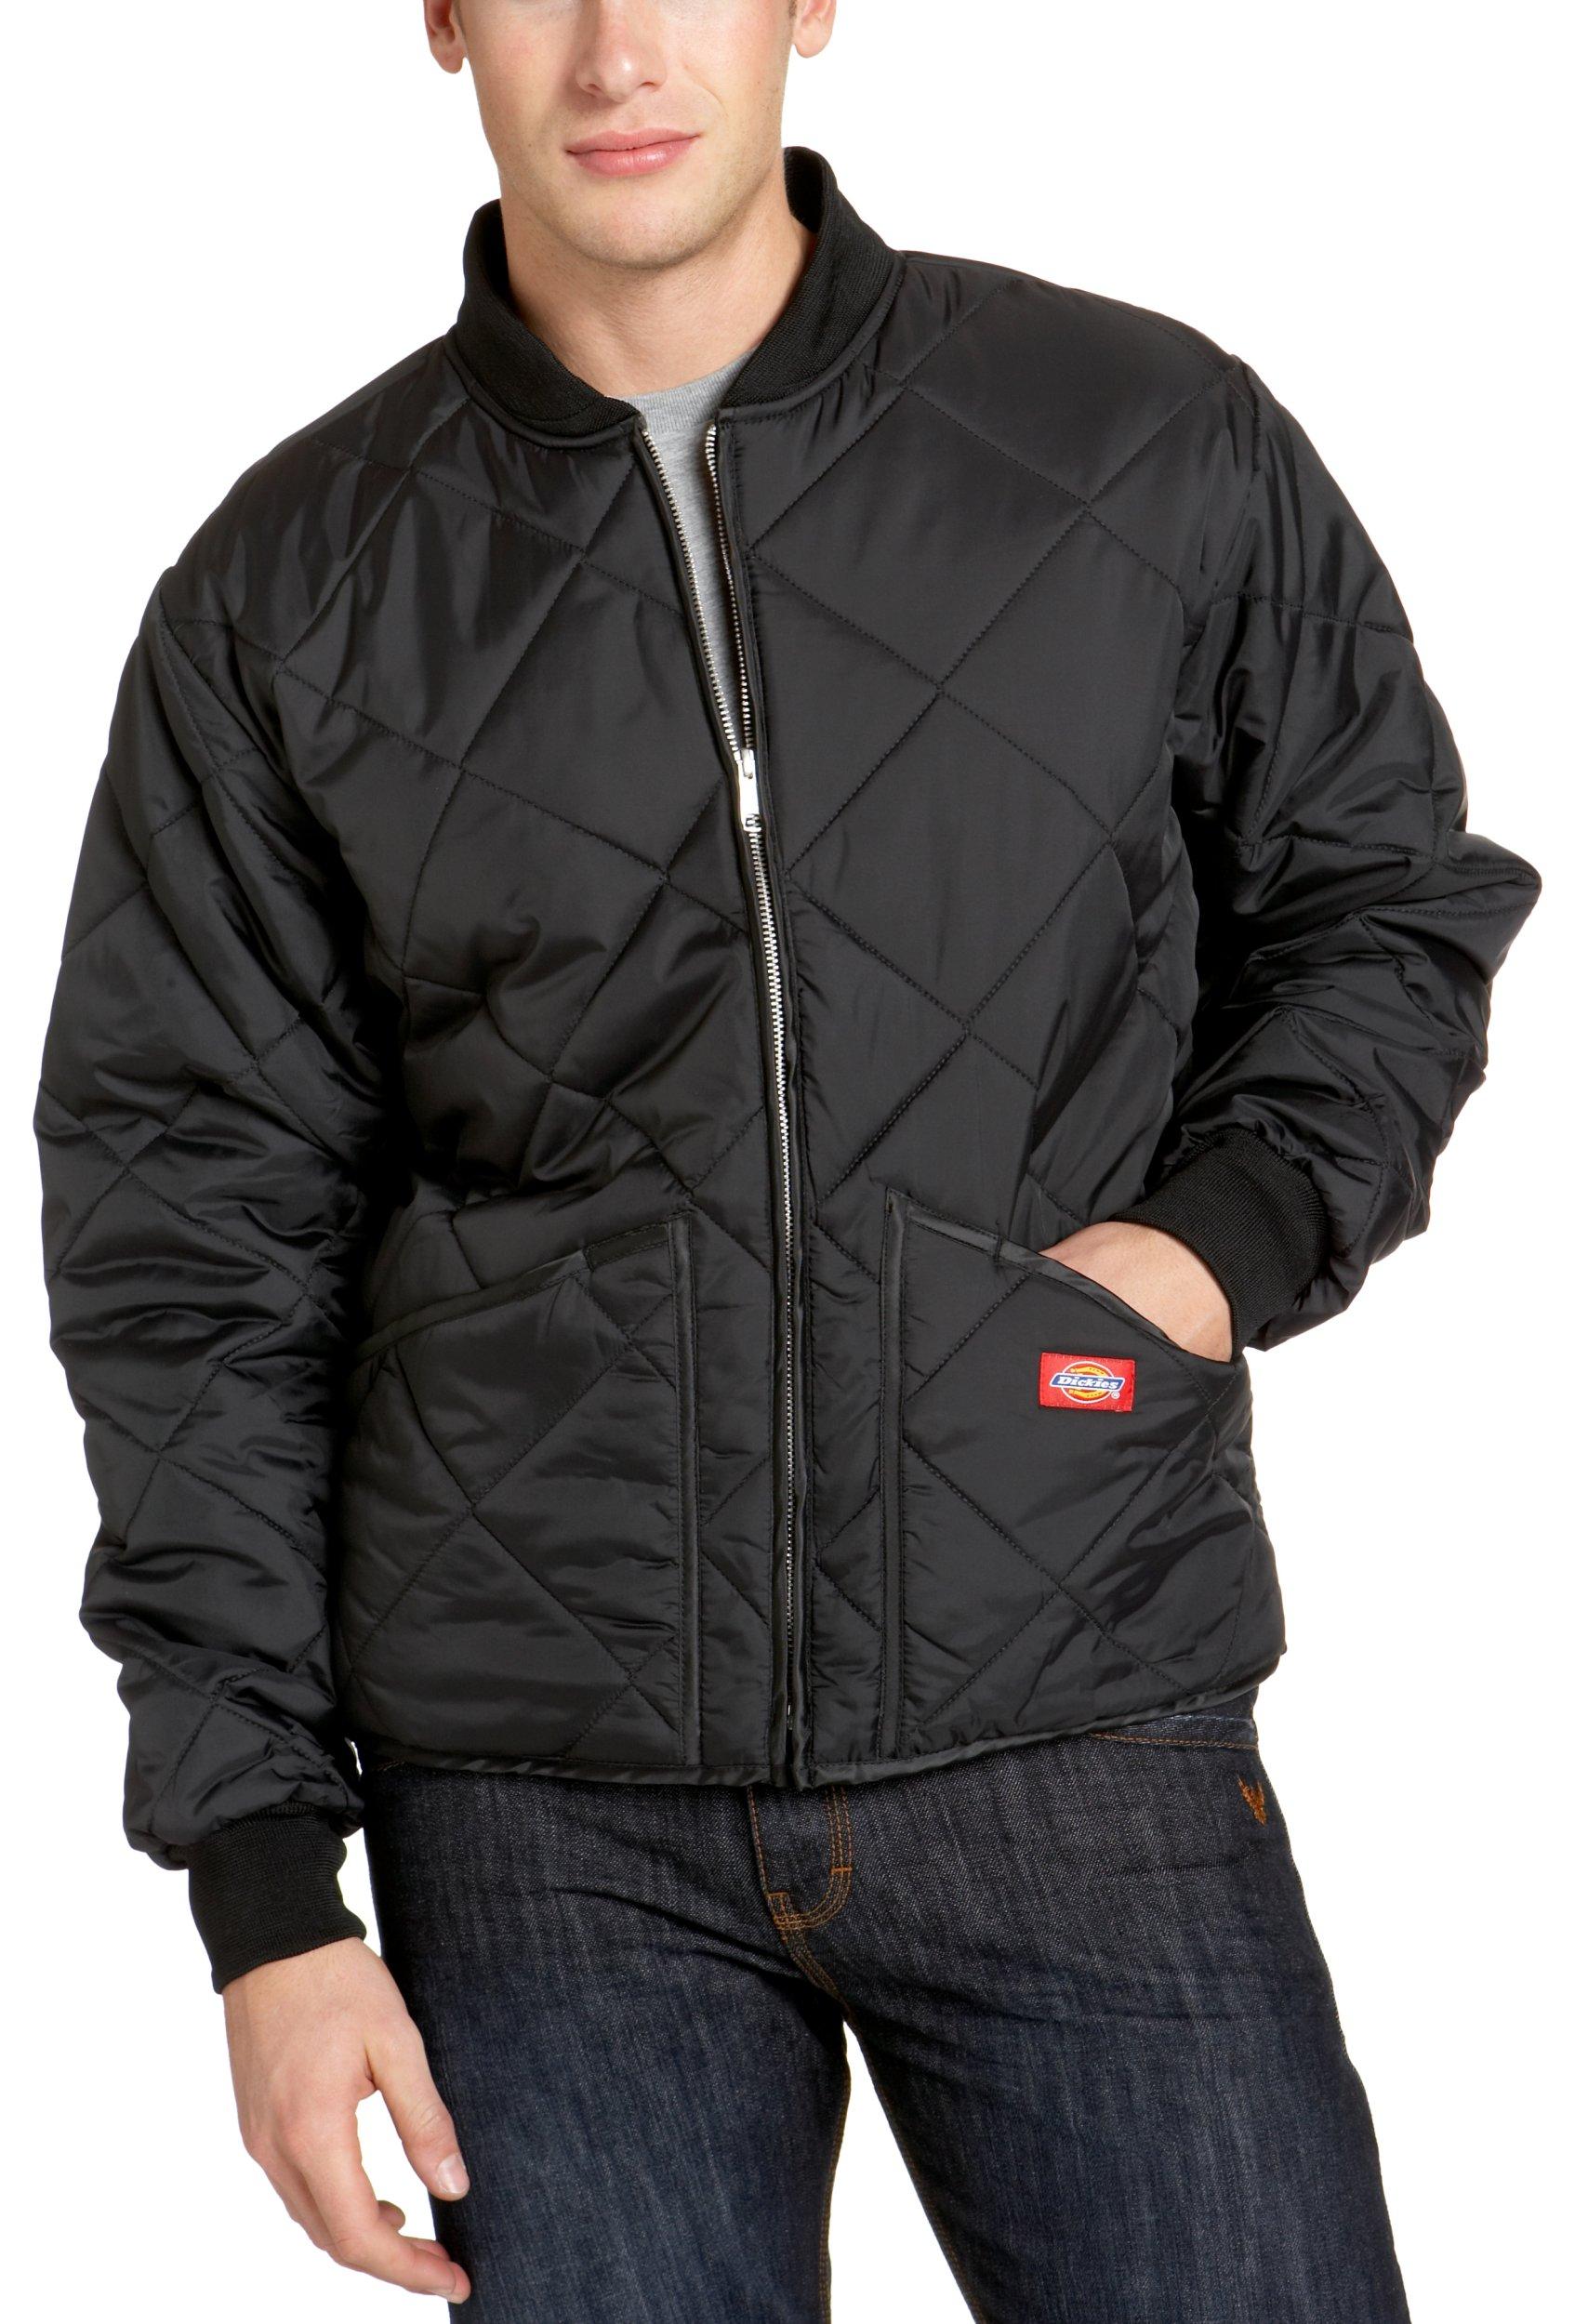 Dickies Men's Water Resistant Diamond Quilted Nylon Jacket, Black, X-Large